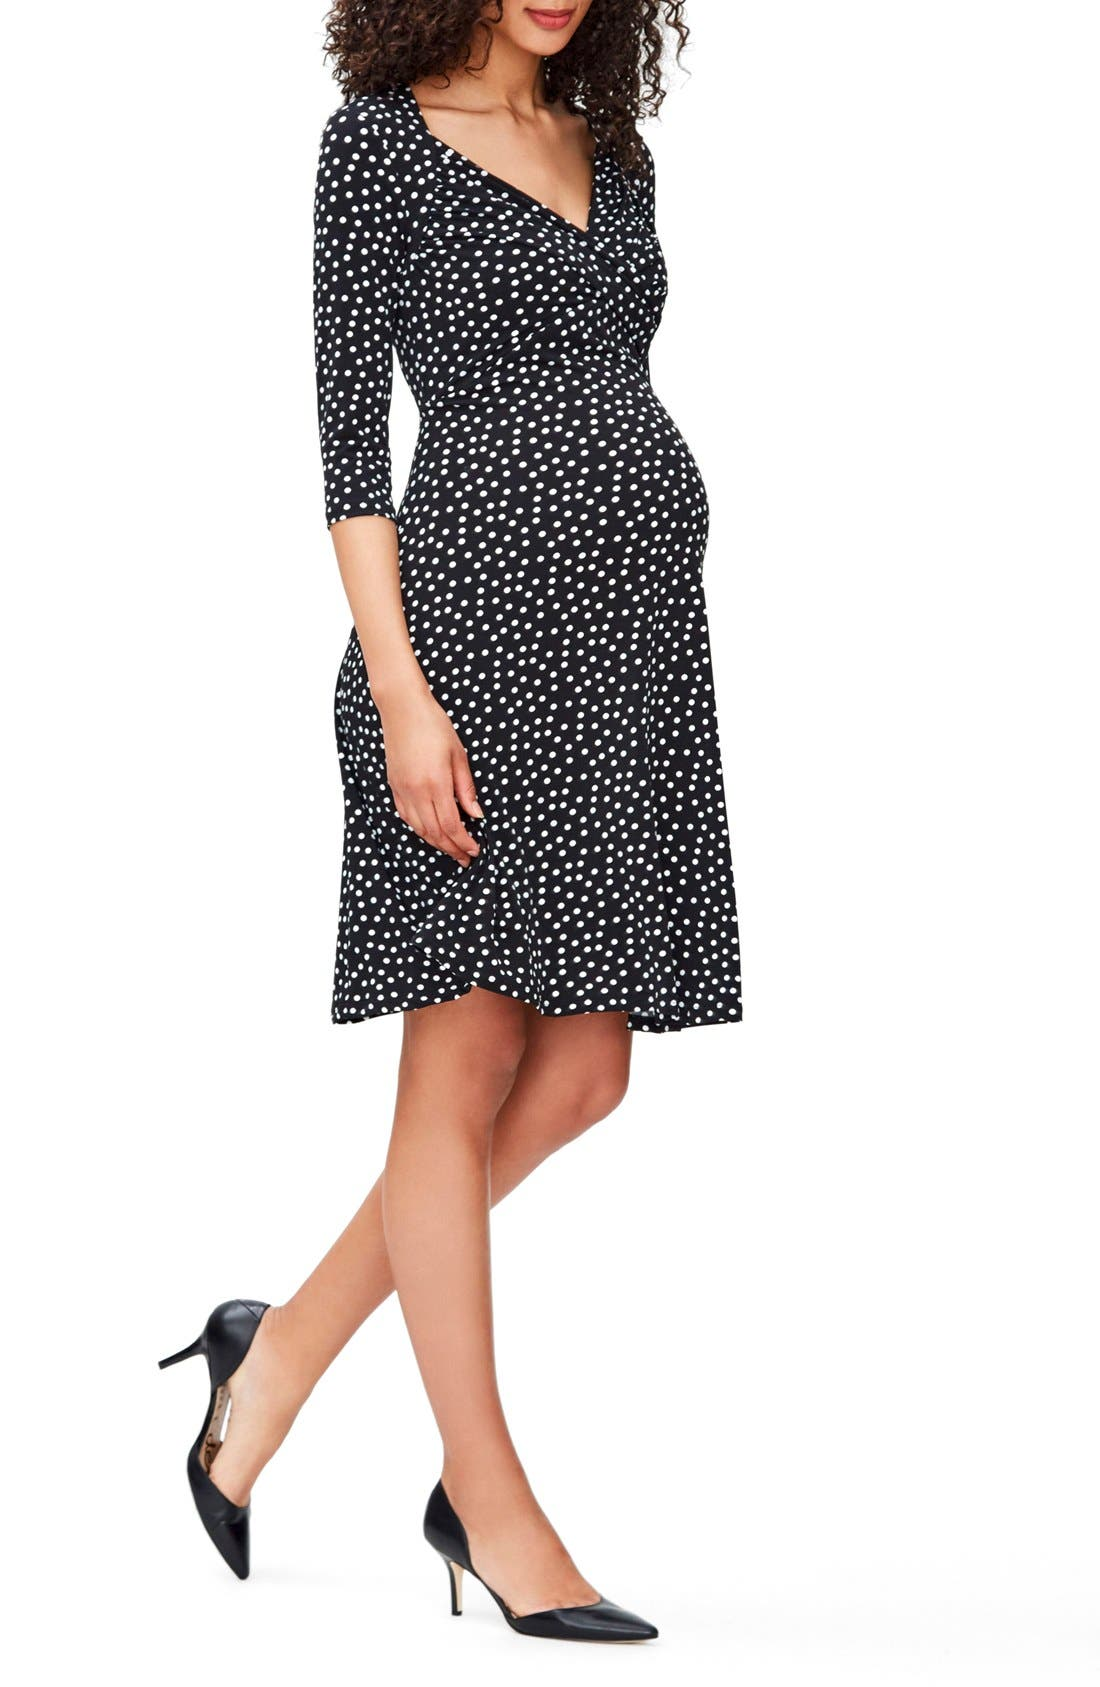 'Sweetheart' Maternity Dress,                         Main,                         color, Black/ Ivory Confetti Dot